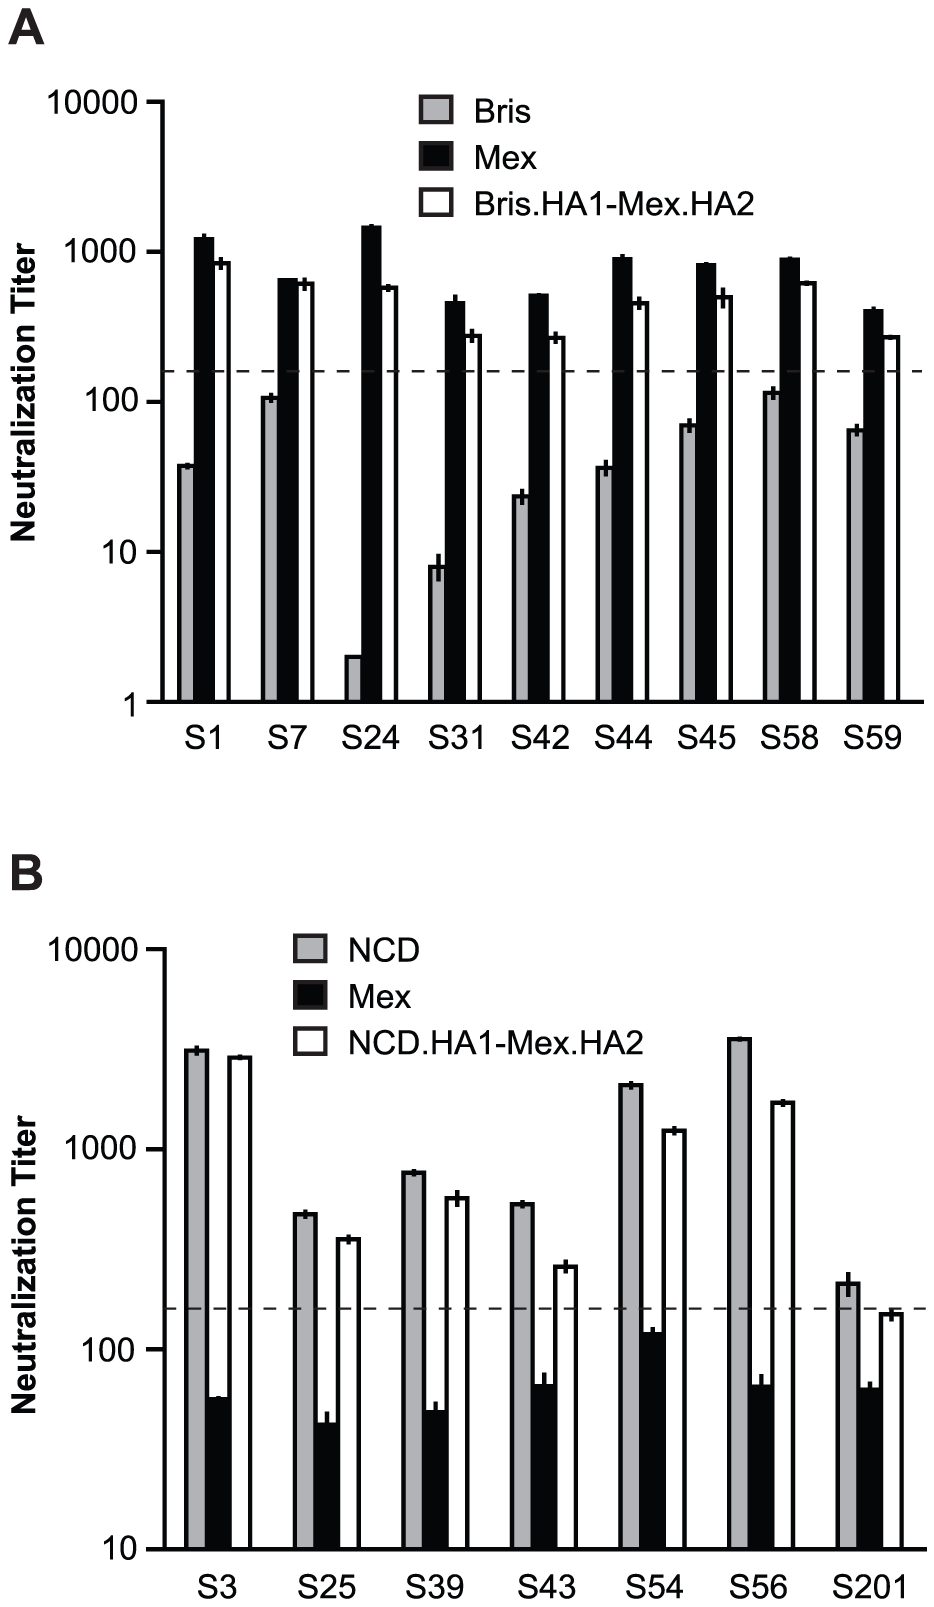 HA2 influences cross-neutralization between Mex/4108/09 and recent seasonal H1N1 influenza A strains.